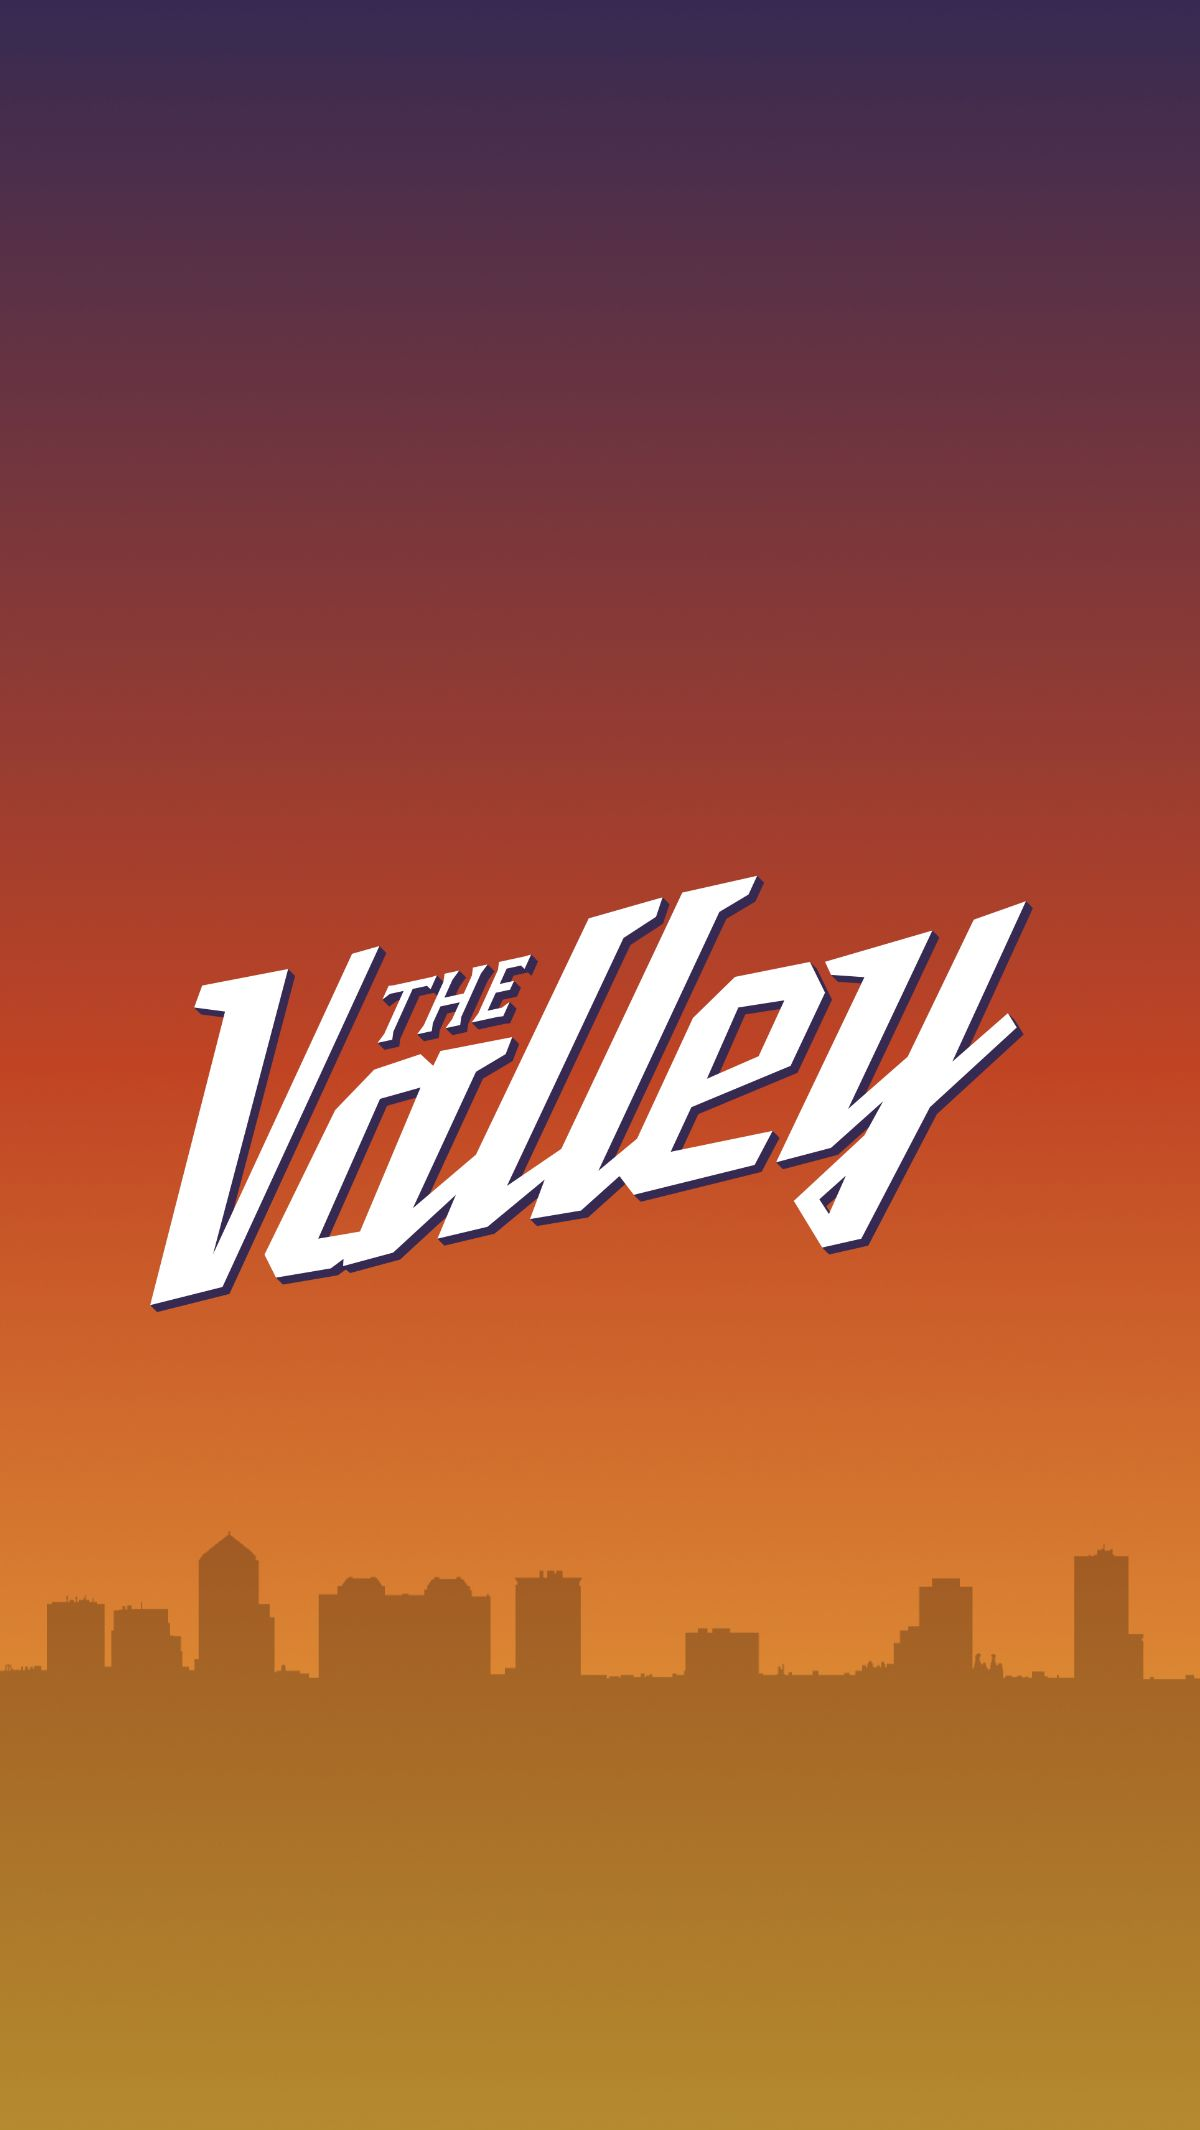 The Valley Phoenix Basketball City Premium T Shirt By Sportsign In 2021 Phoenix Basketball Phoenix Suns Basketball Phoenix Suns